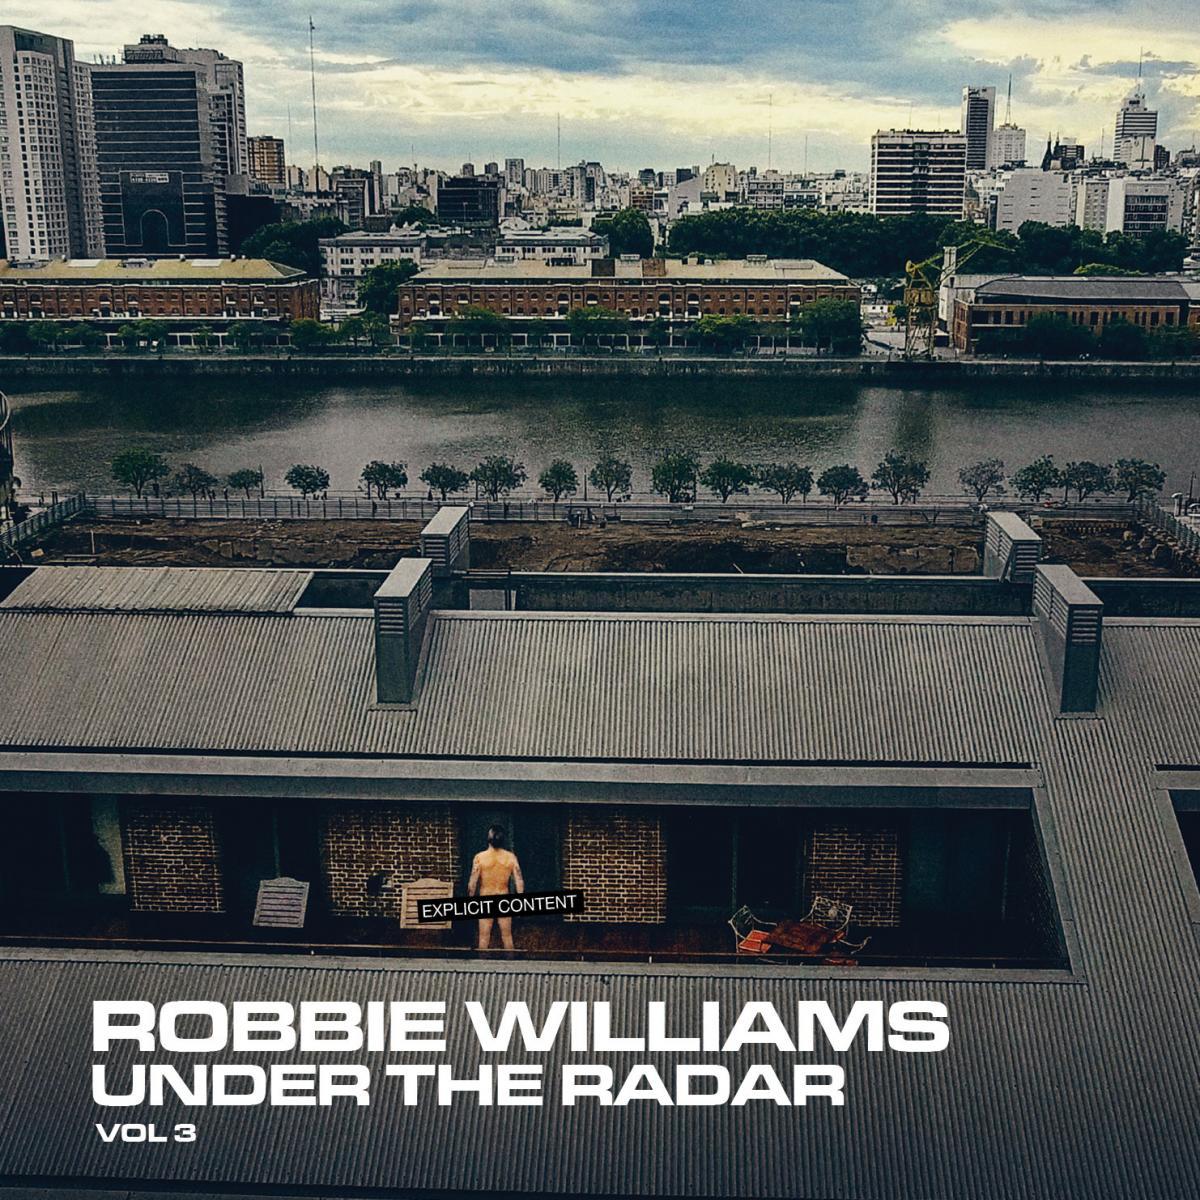 Under The Radar Vol 2